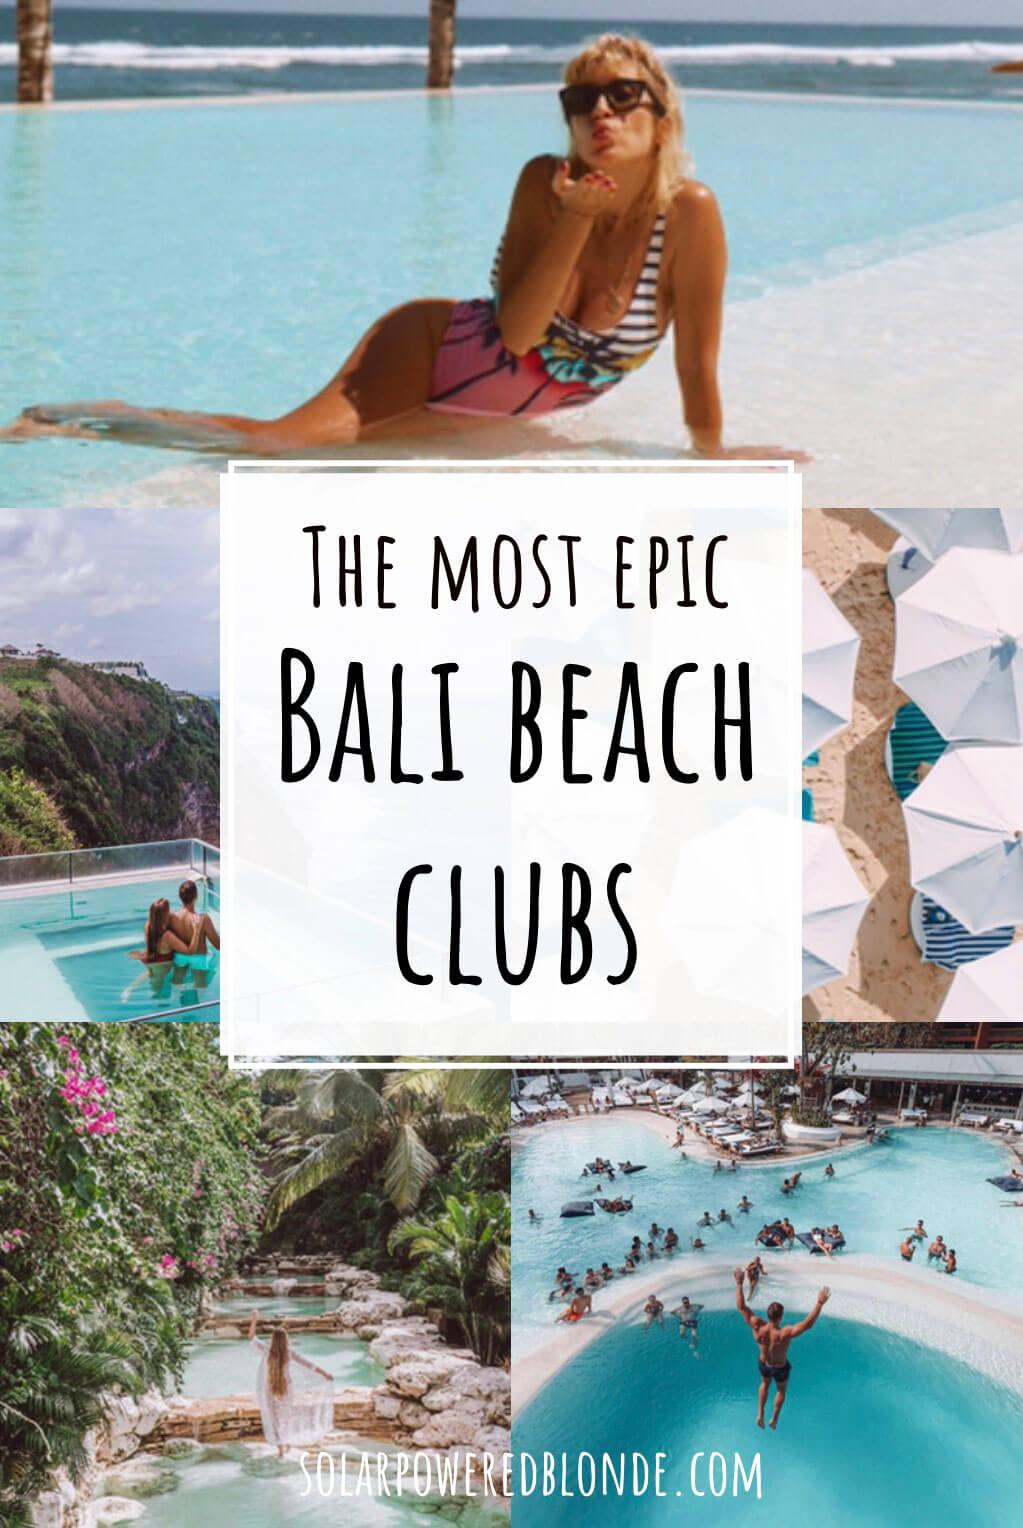 Best beach clubs in bali pinterest graphic